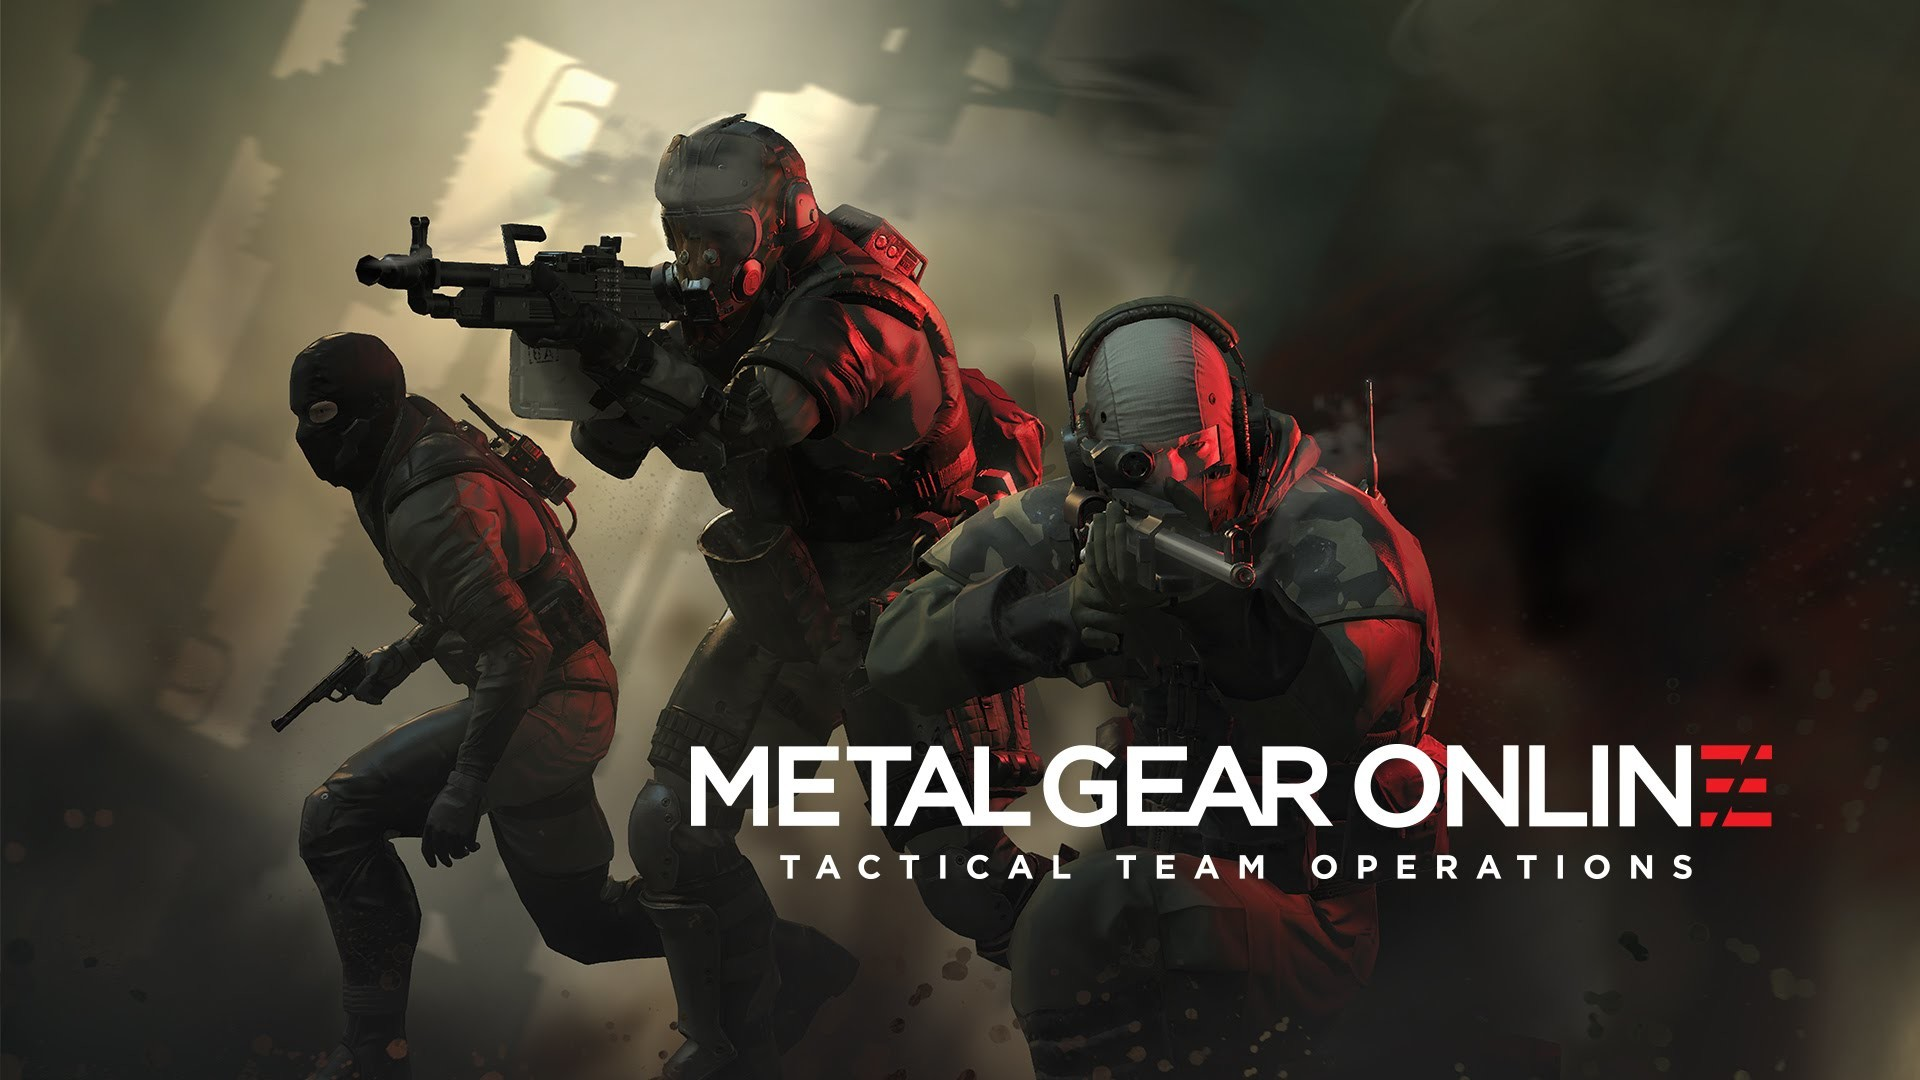 Metal Gear Online DLC Para Metal Gear Solid V: The Phantom Pain. – YouTube